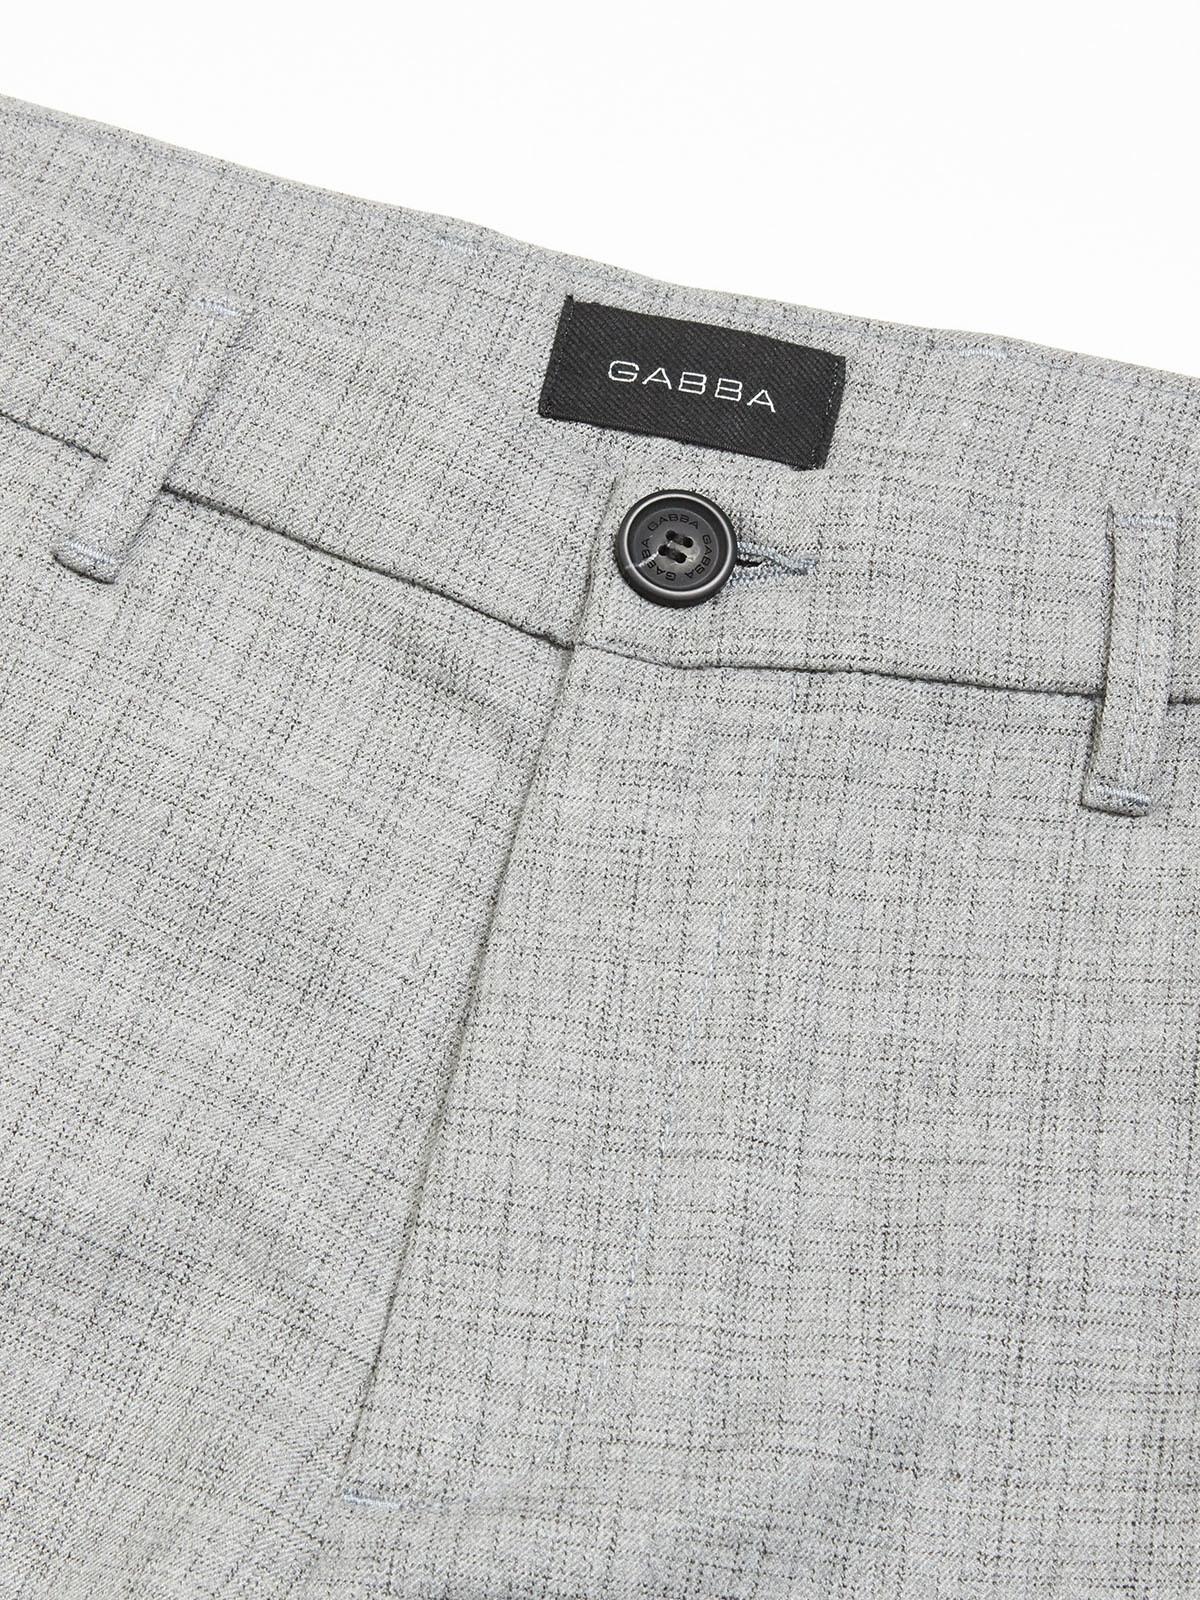 Gabba Denim Gabba Pisa Cross Check Pants Light Grey